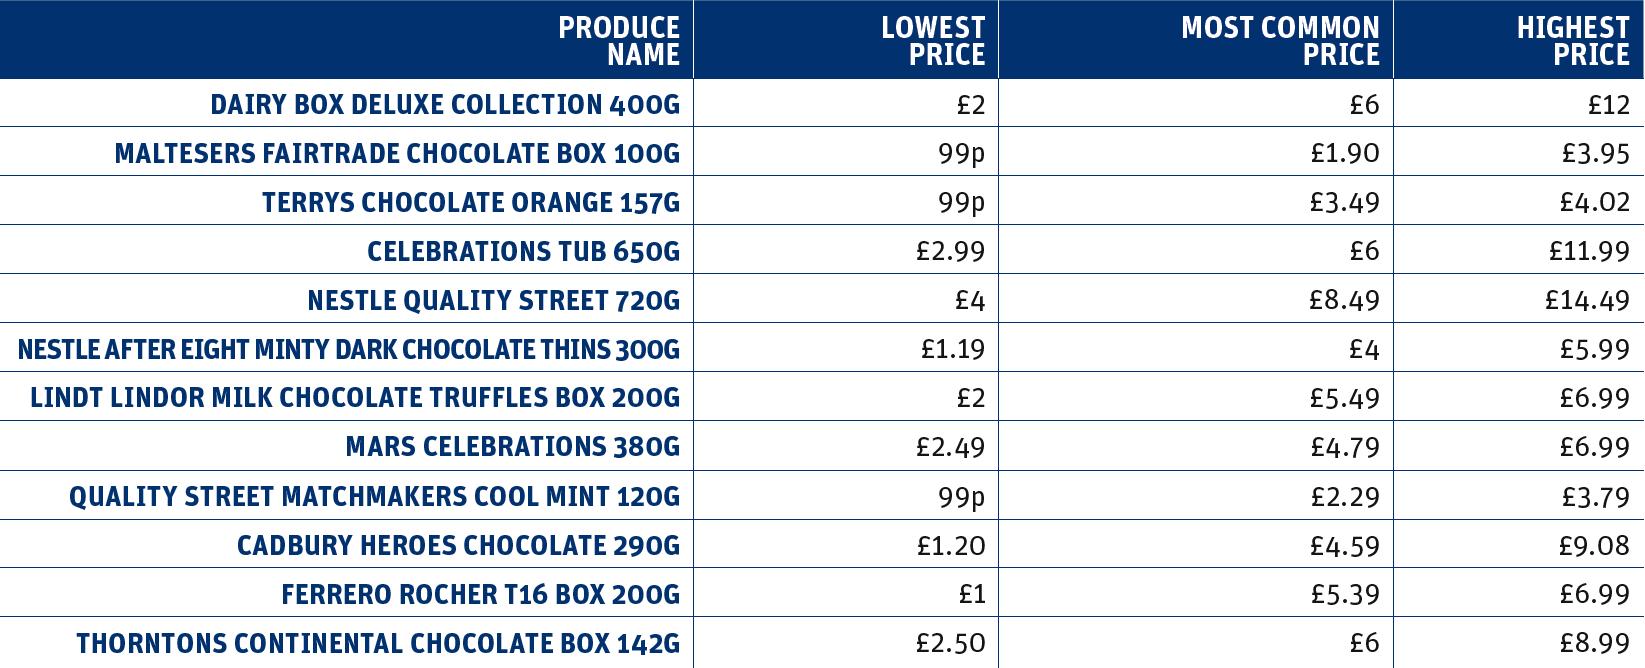 Boxed chocolate price comparison chart